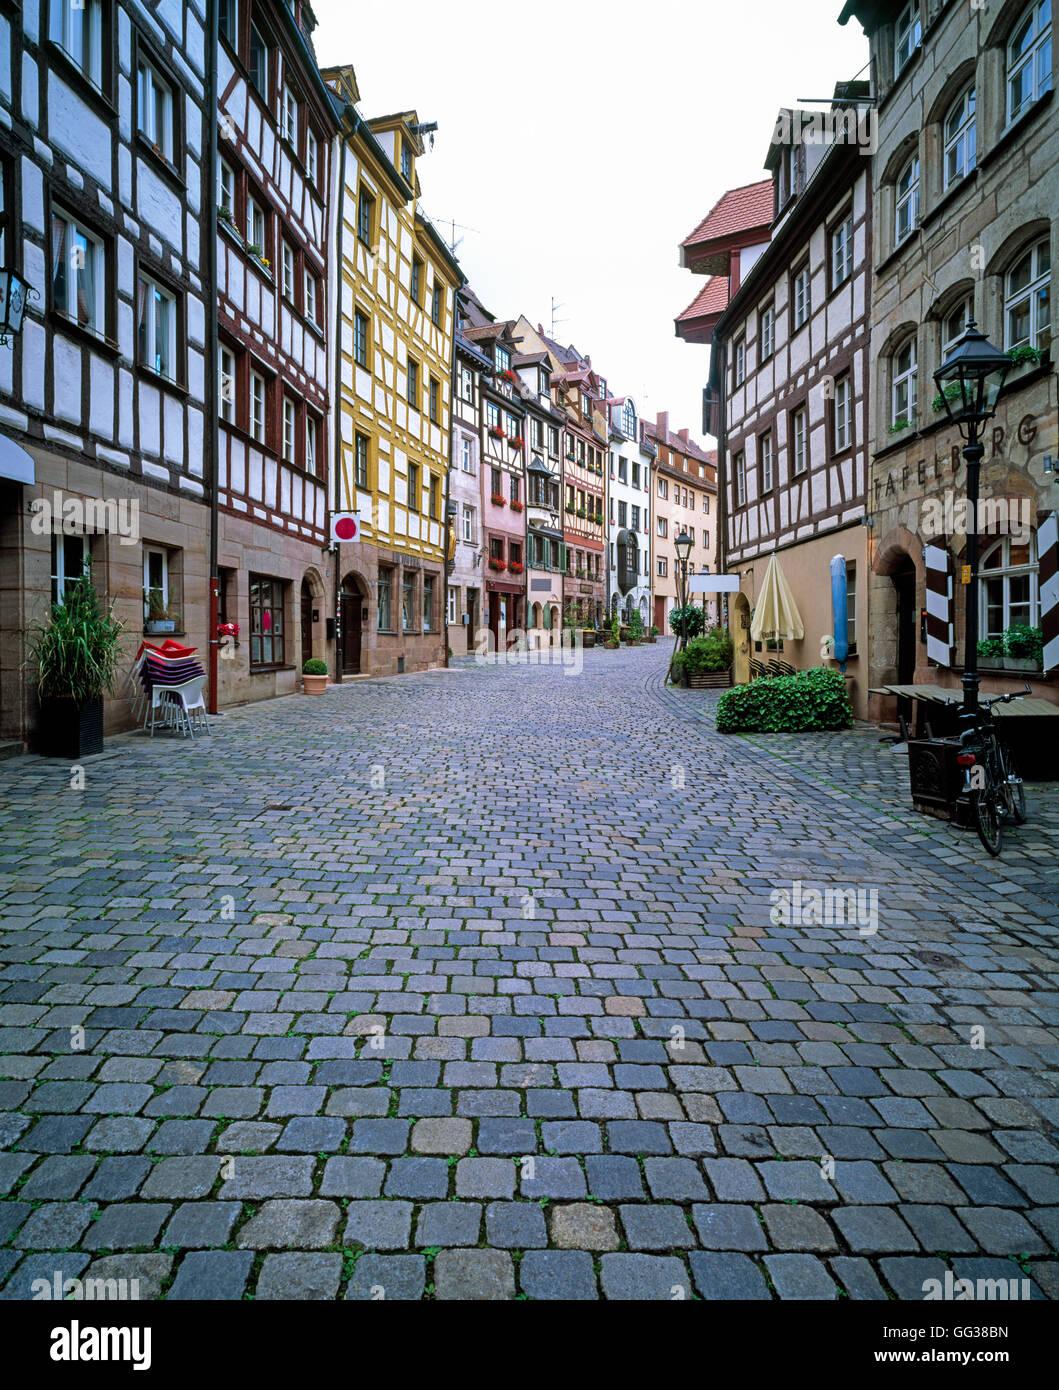 Half timbered architectur, Nuremberg, Germany - Stock Image